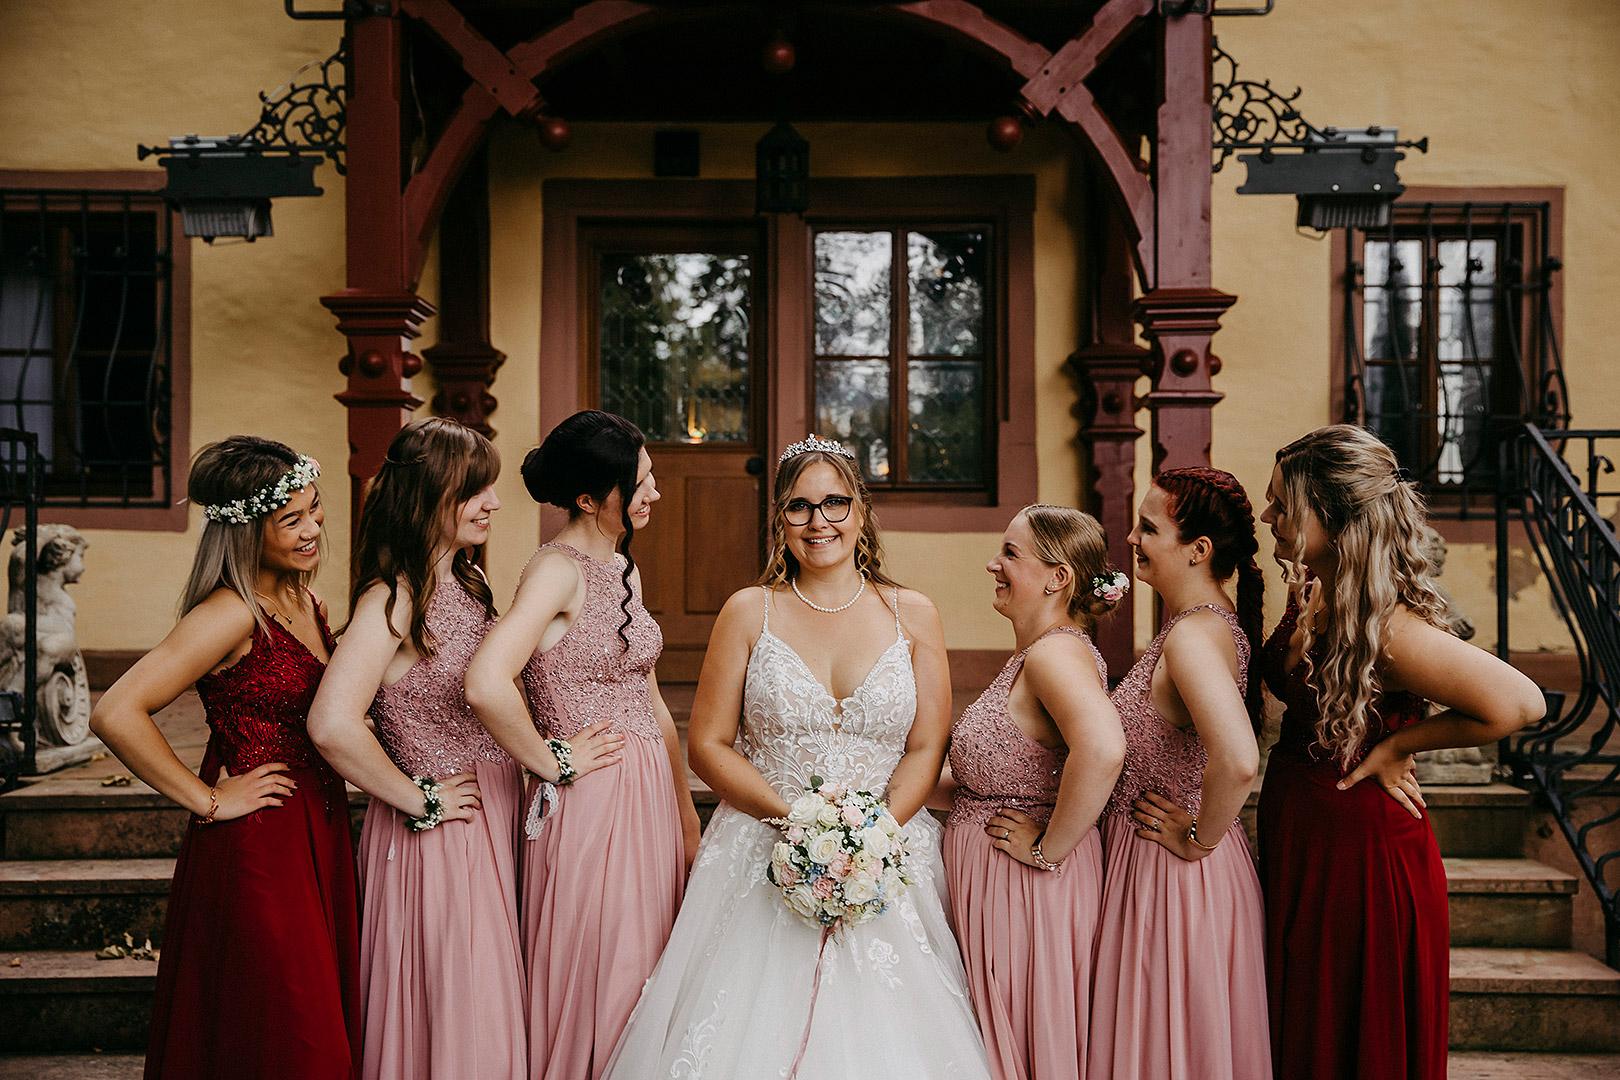 portrait_wedding_saskiaunddavid_46